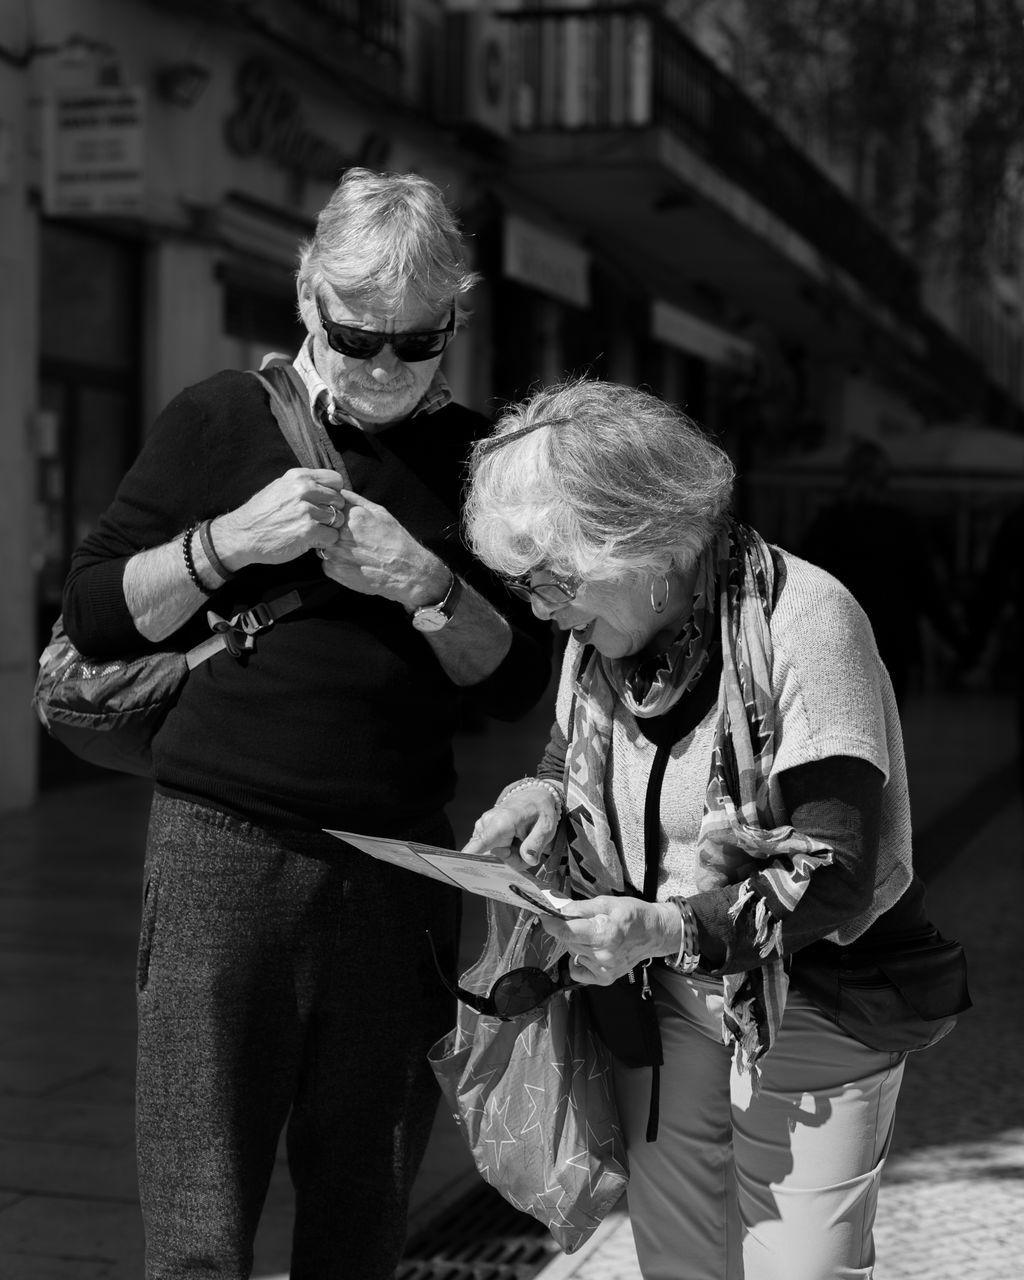 WOMAN HOLDING UMBRELLA ON SIDEWALK